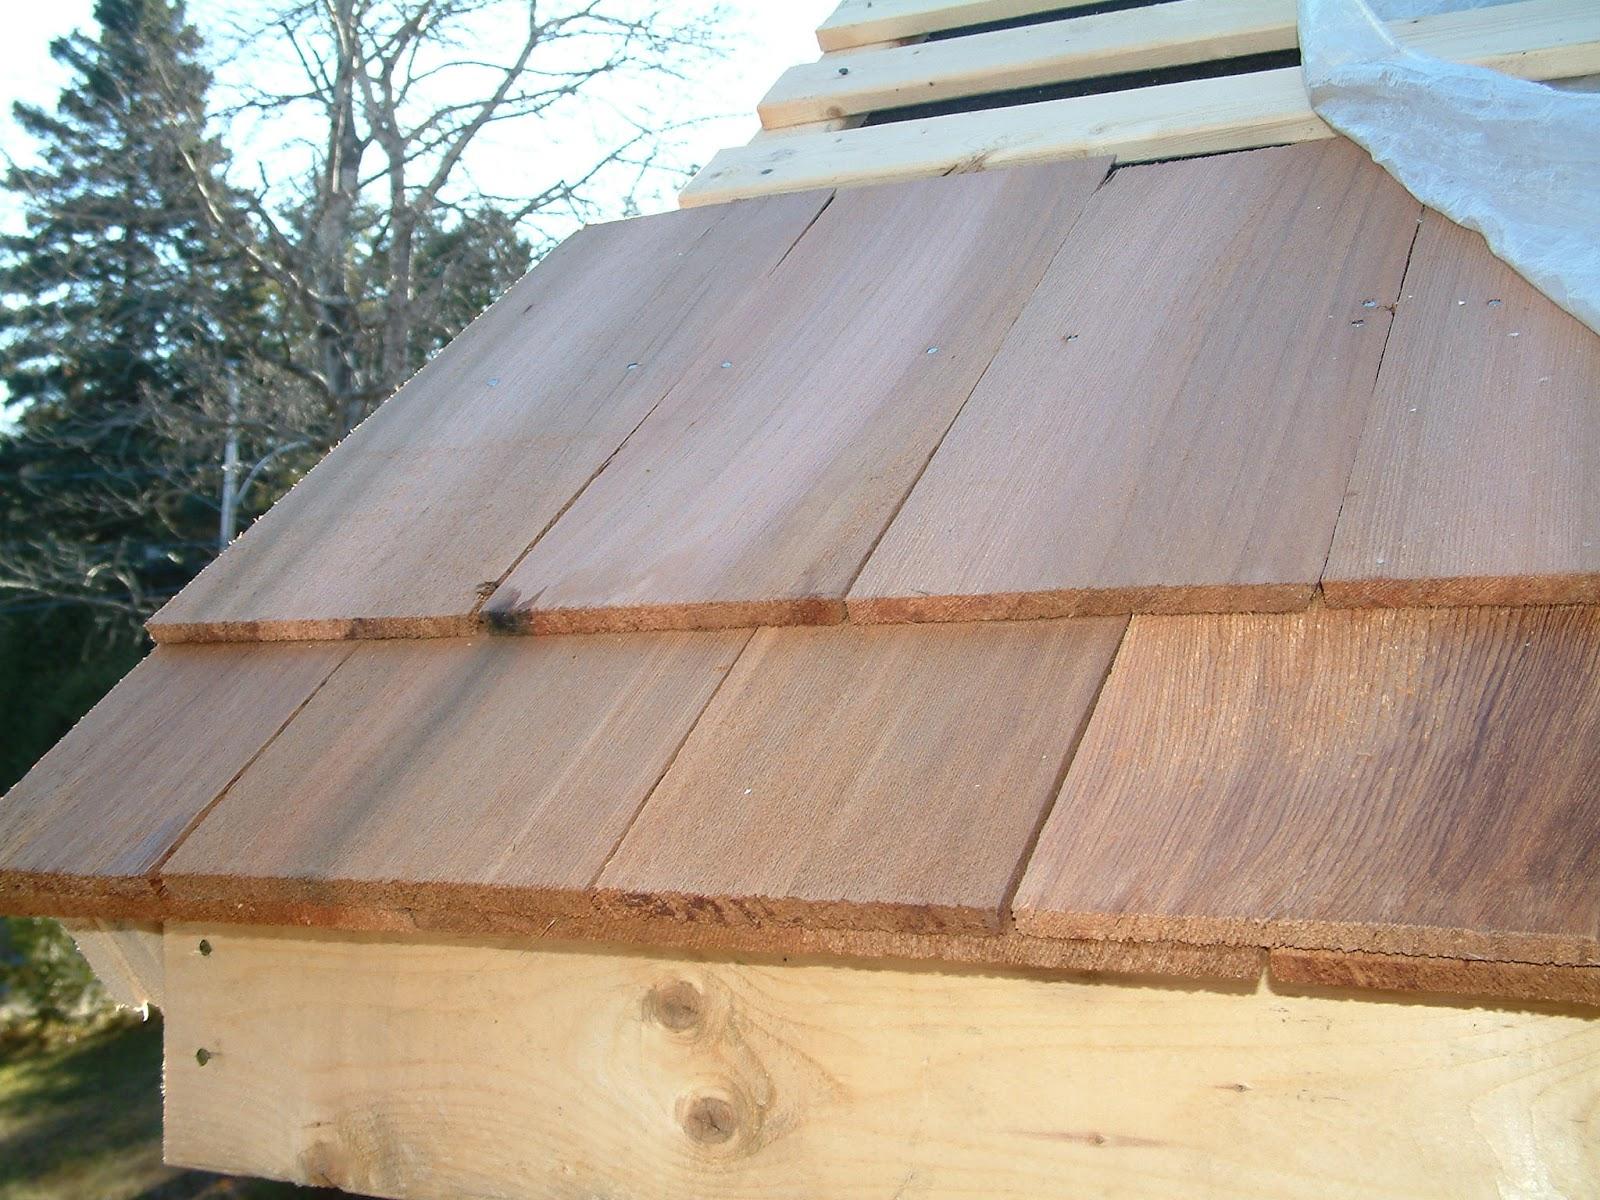 le projet timber frame de c line et pierre timberframe project bardeau de c dre 101. Black Bedroom Furniture Sets. Home Design Ideas